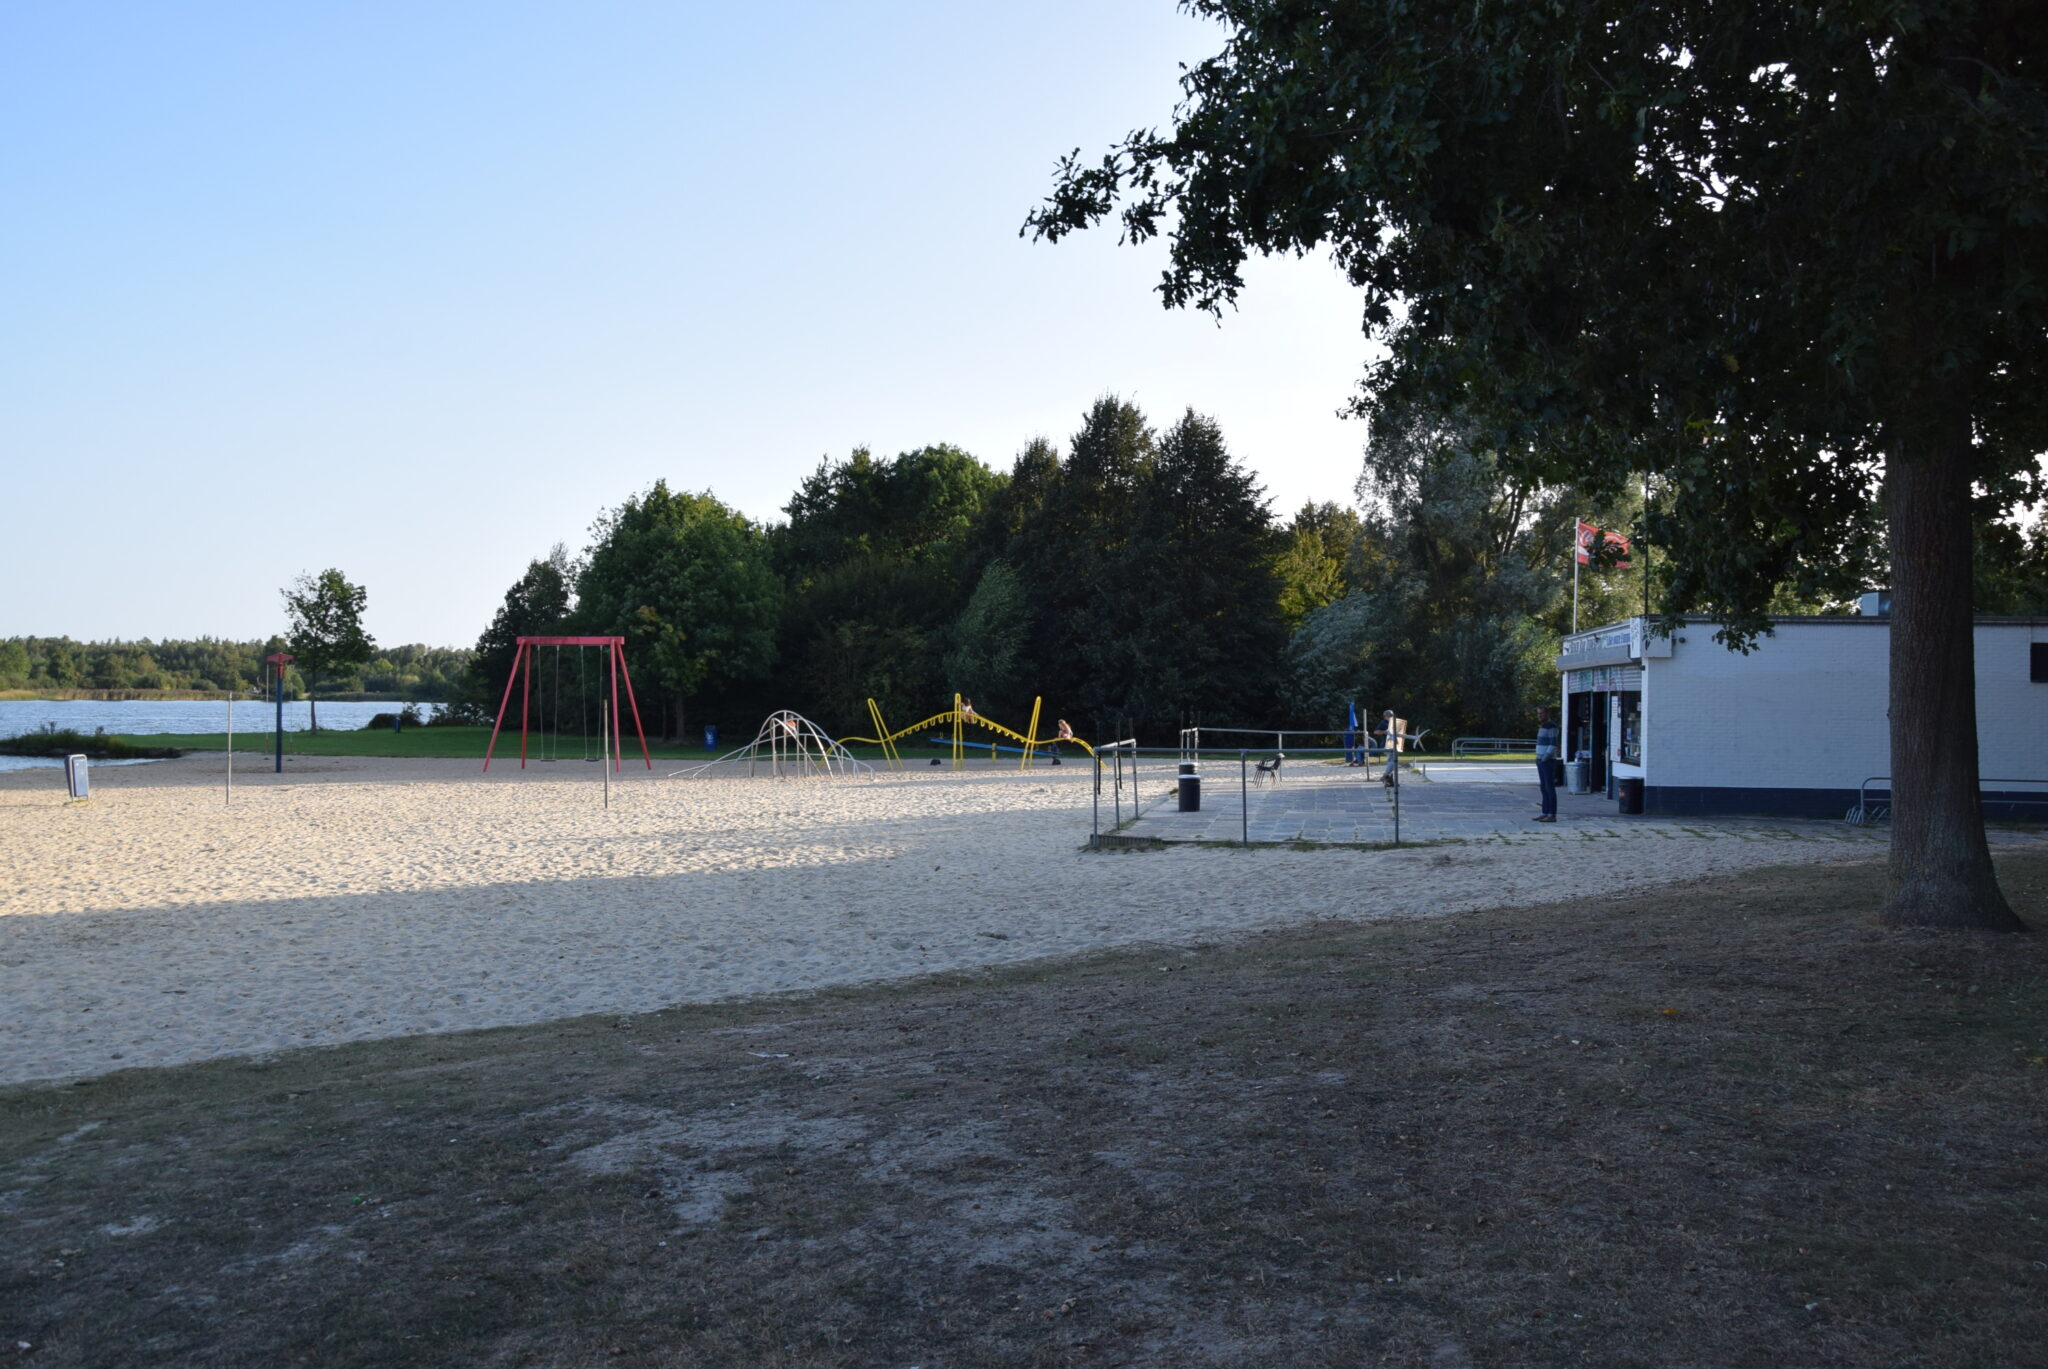 Strand van Zuiderplas in 2020